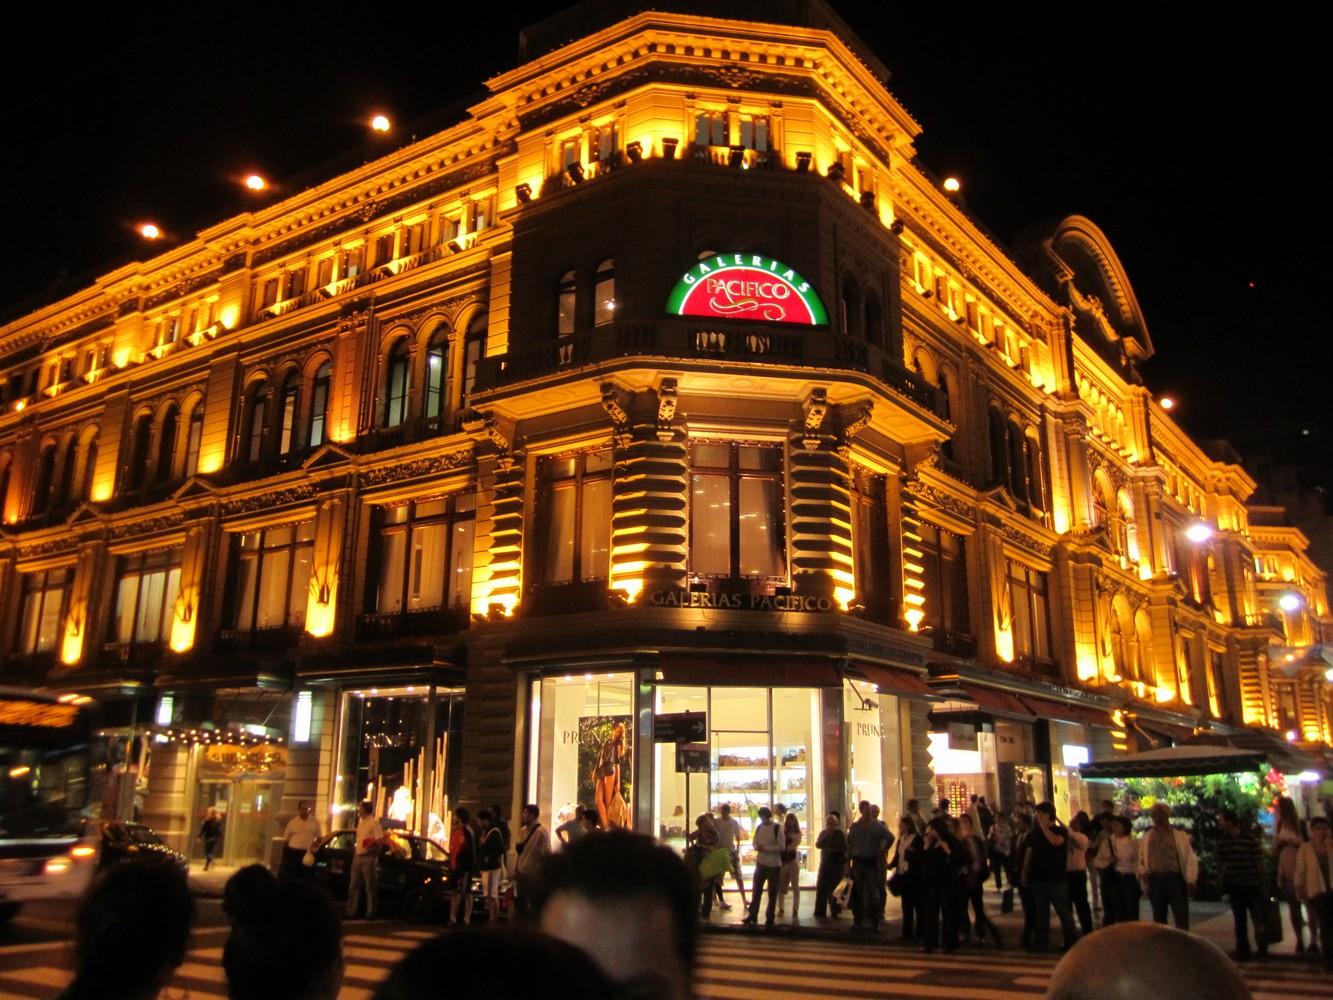 Rue Florida - Buenos Aires